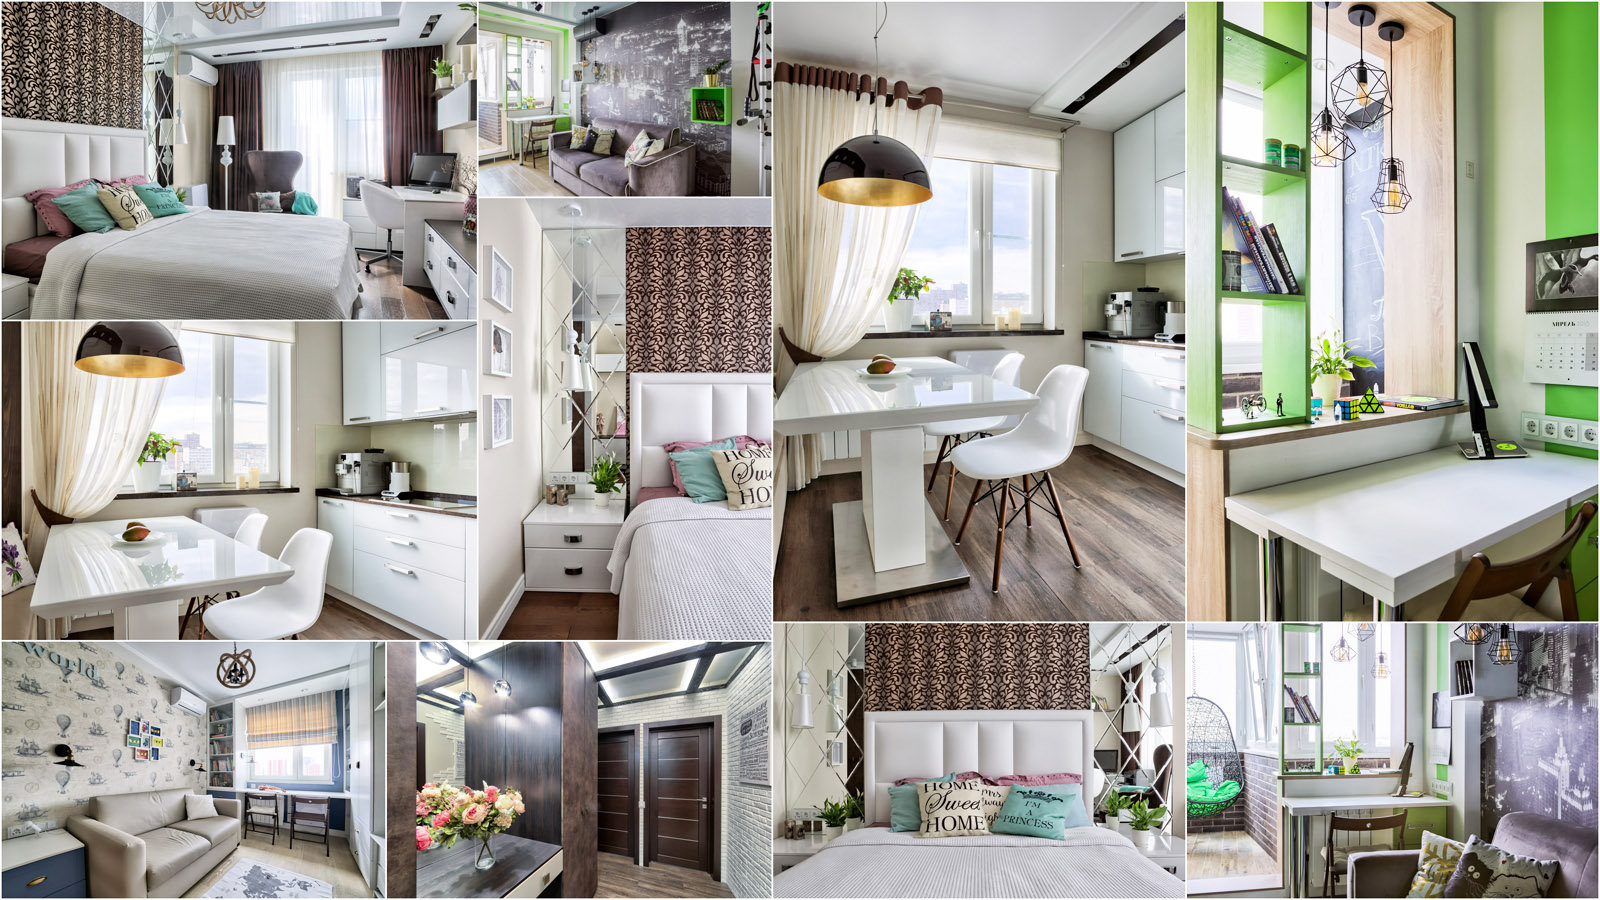 Пример интерьеной фотосъемки квартиры. Интерьерный фотогаф https://www.kirillov.space